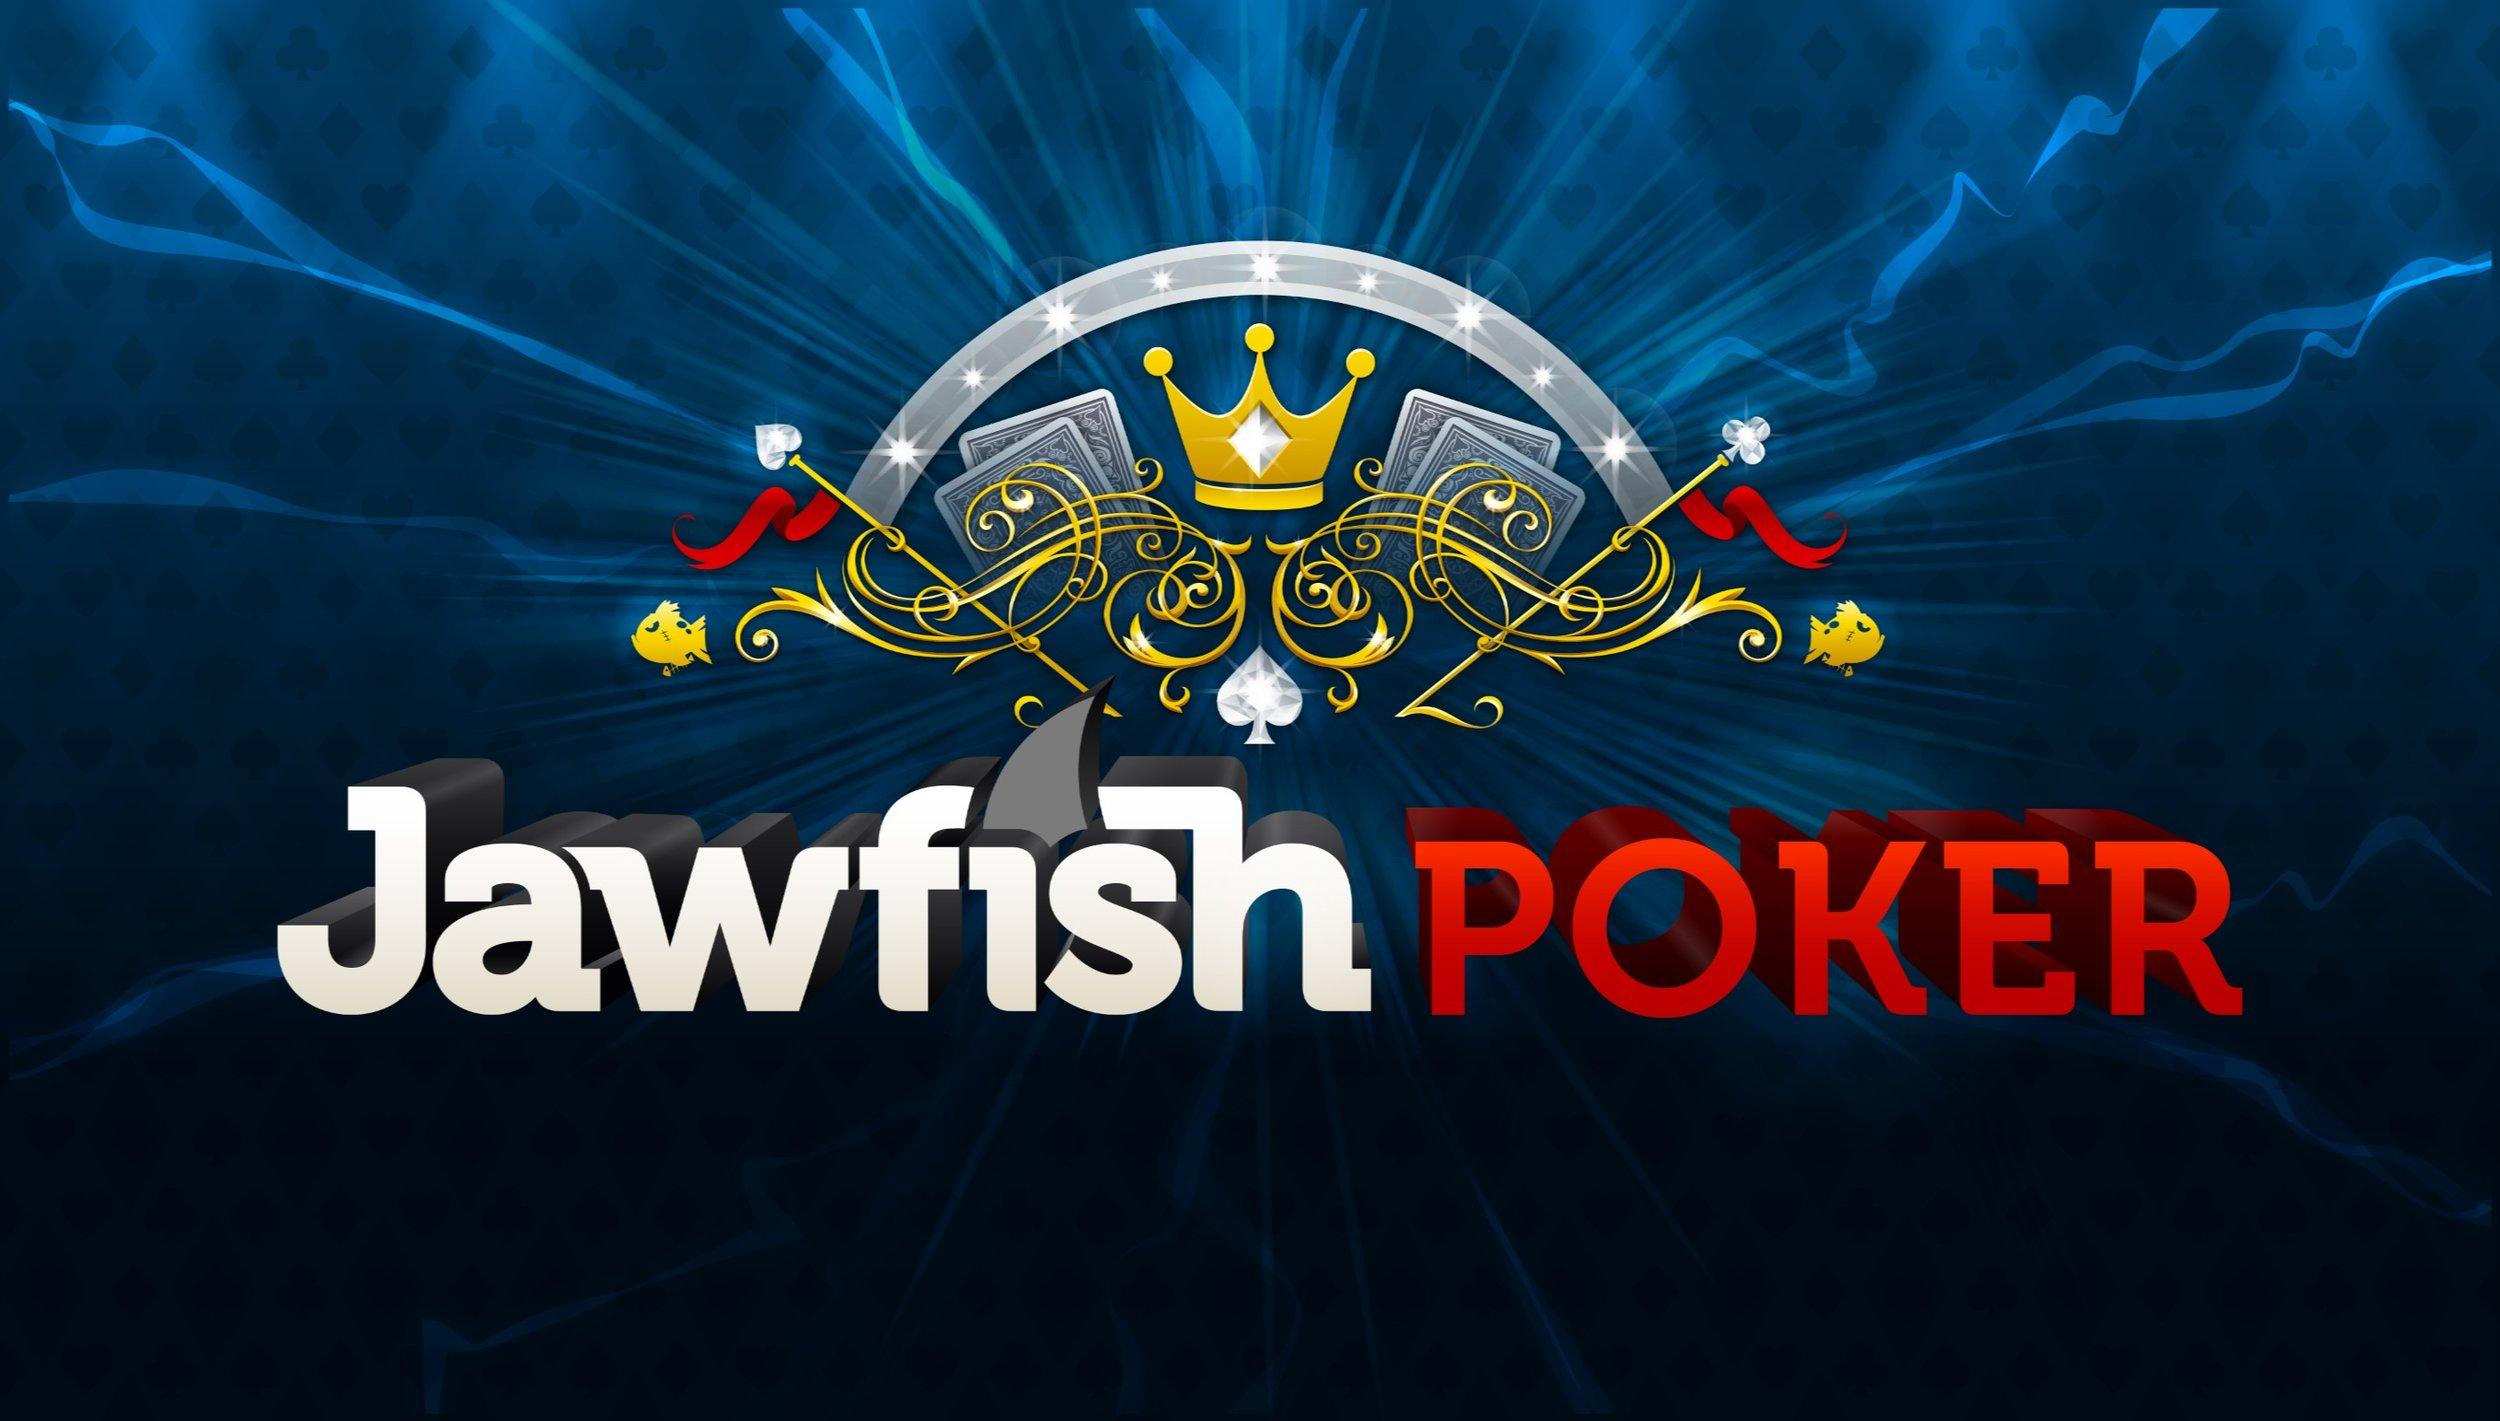 JawfishPoker.jpg